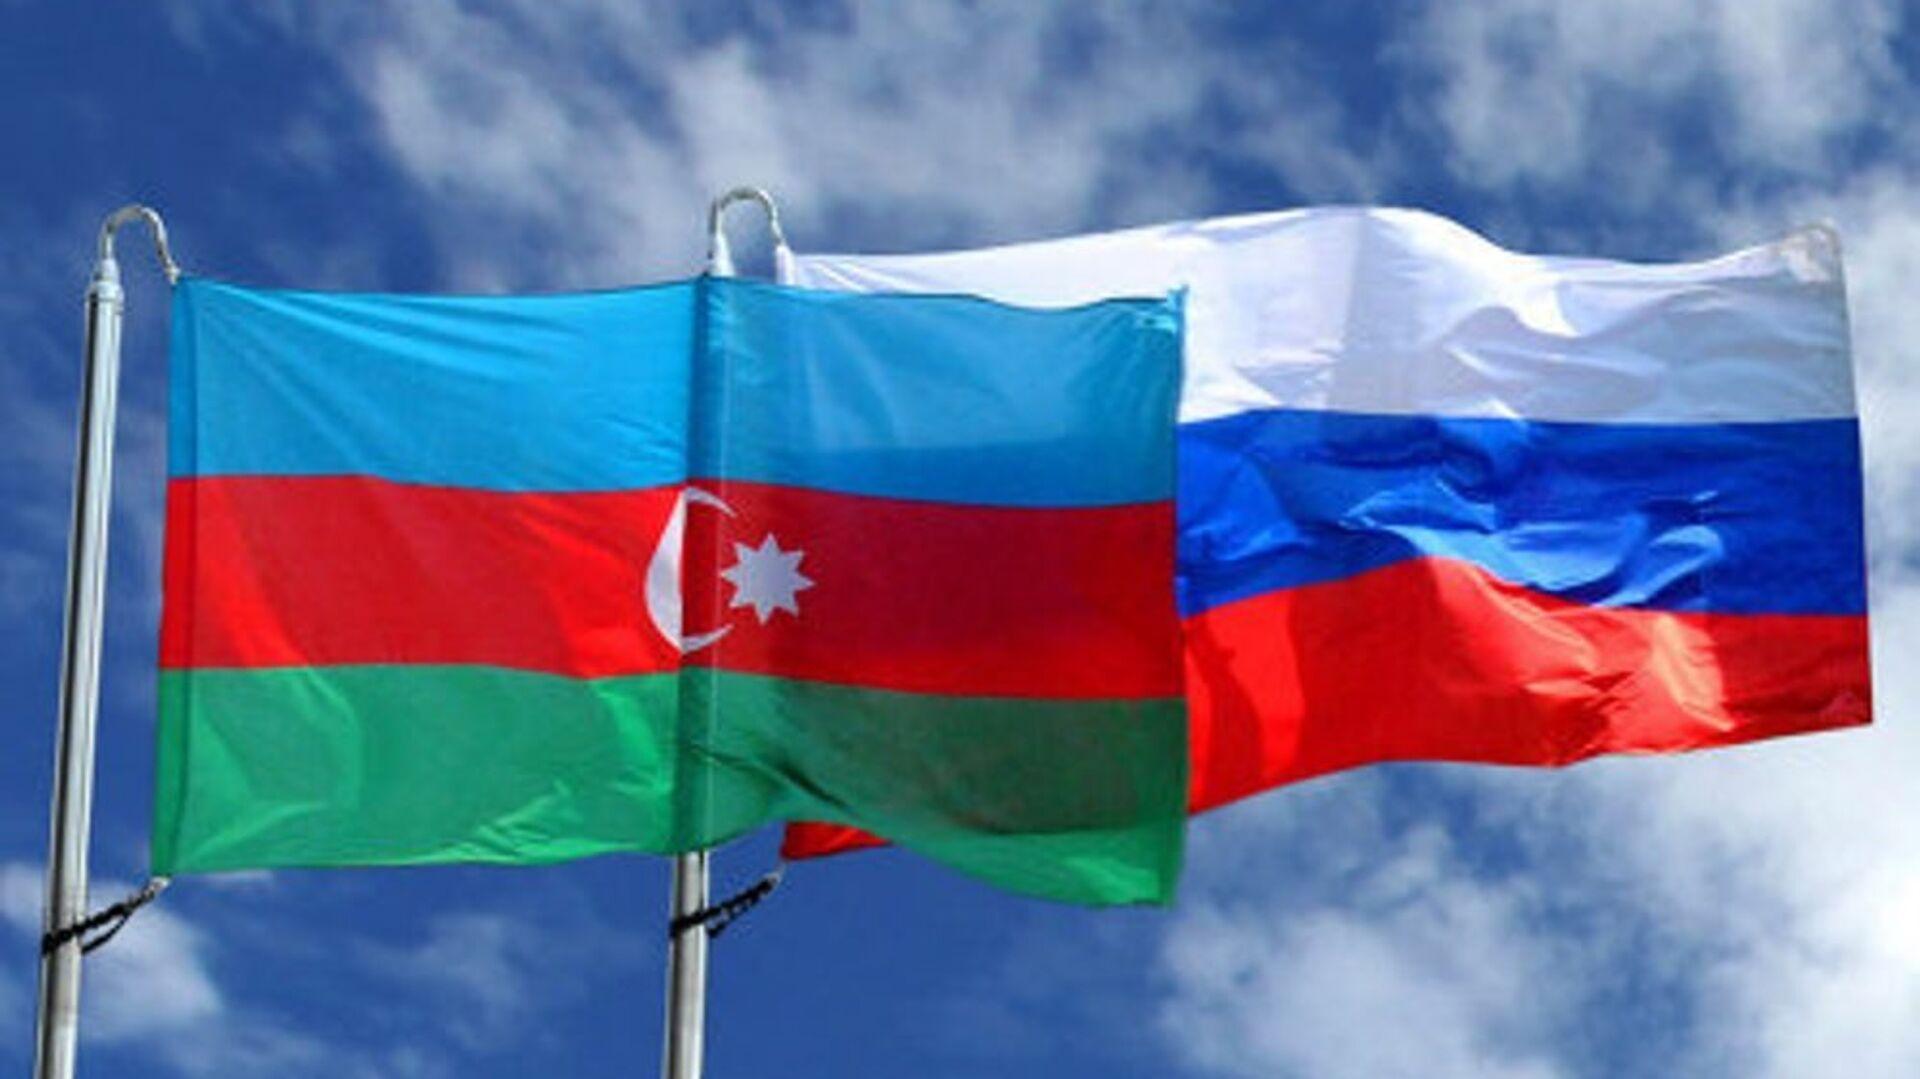 флаг Азербайджан-Россия - Sputnik Азербайджан, 1920, 28.09.2021